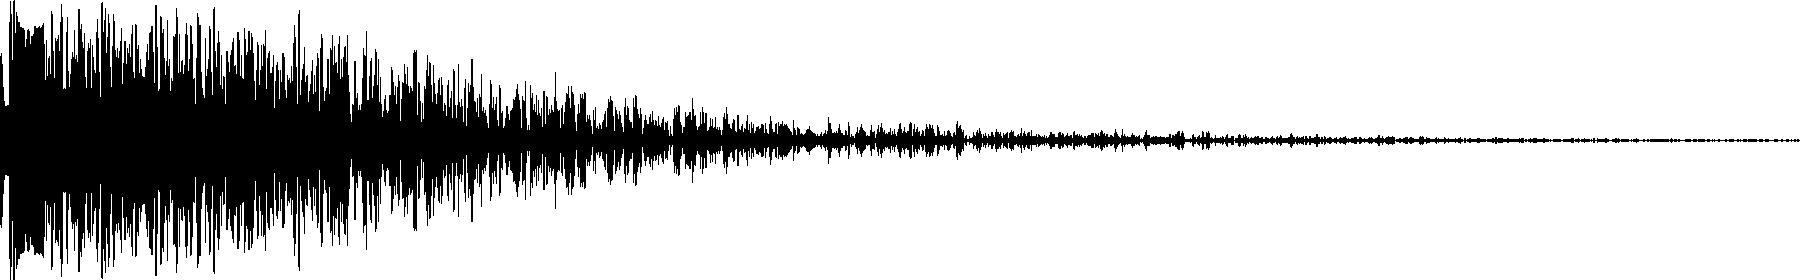 perc 2